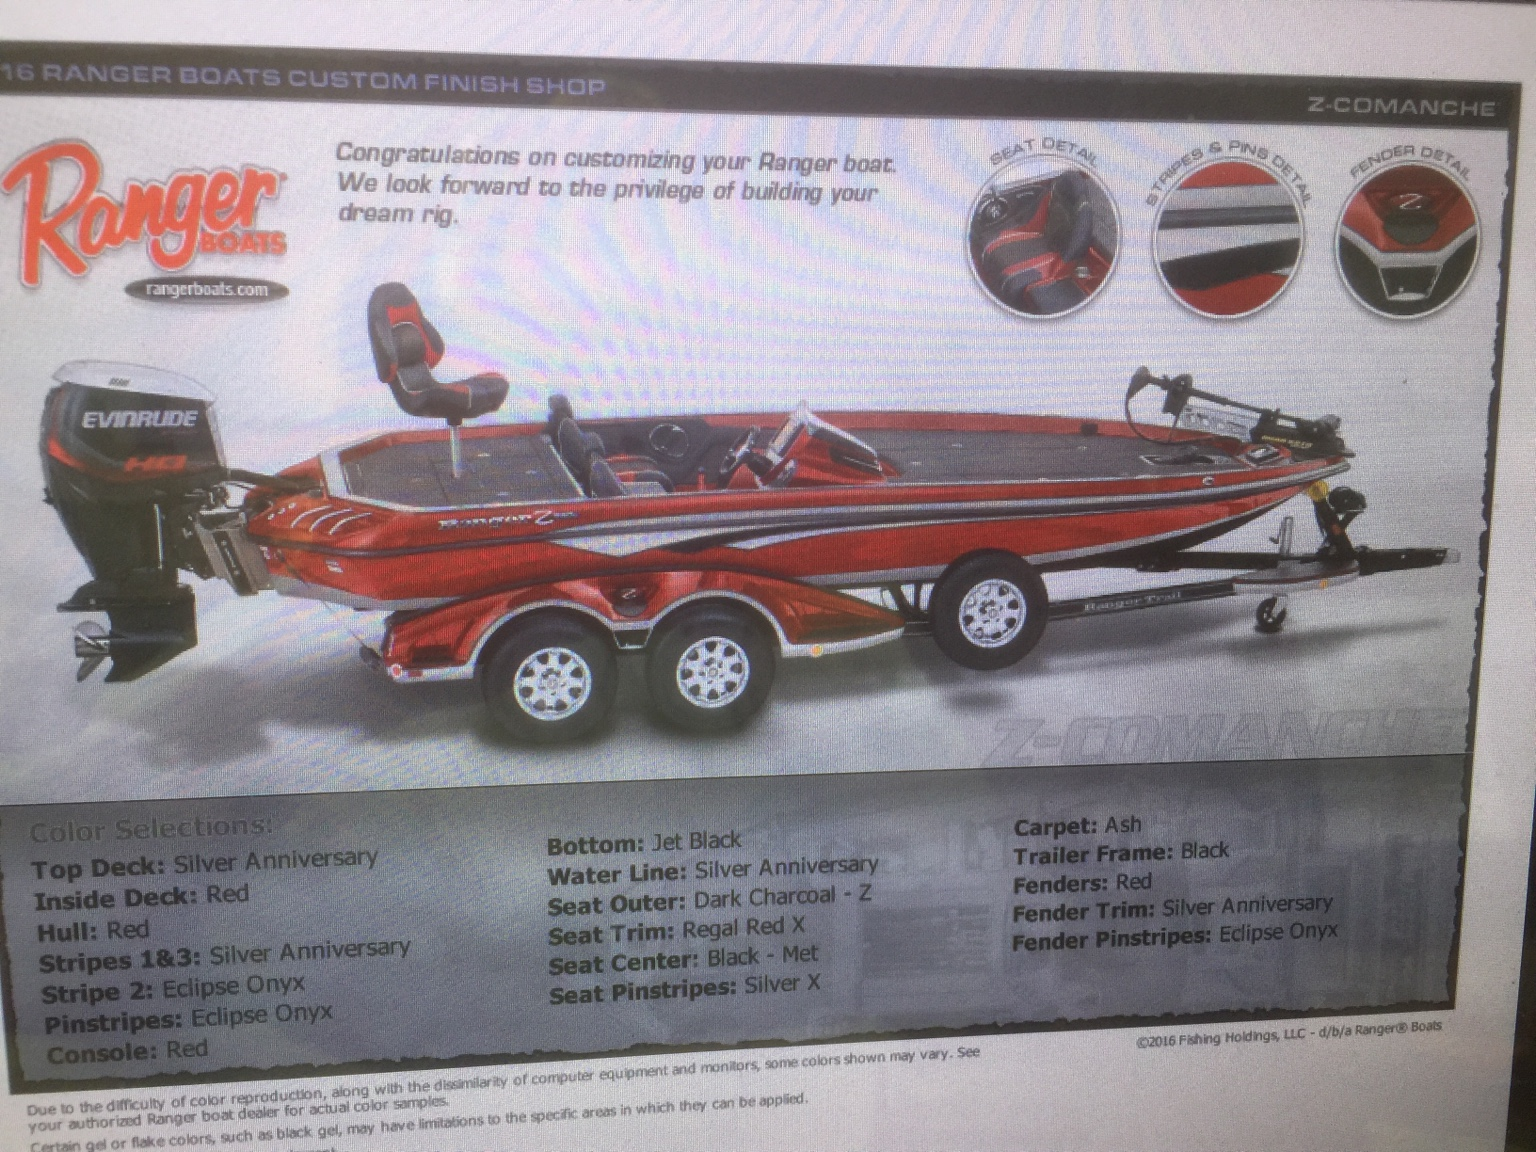 Crappie com - America's Friendliest Crappie Fishing Community